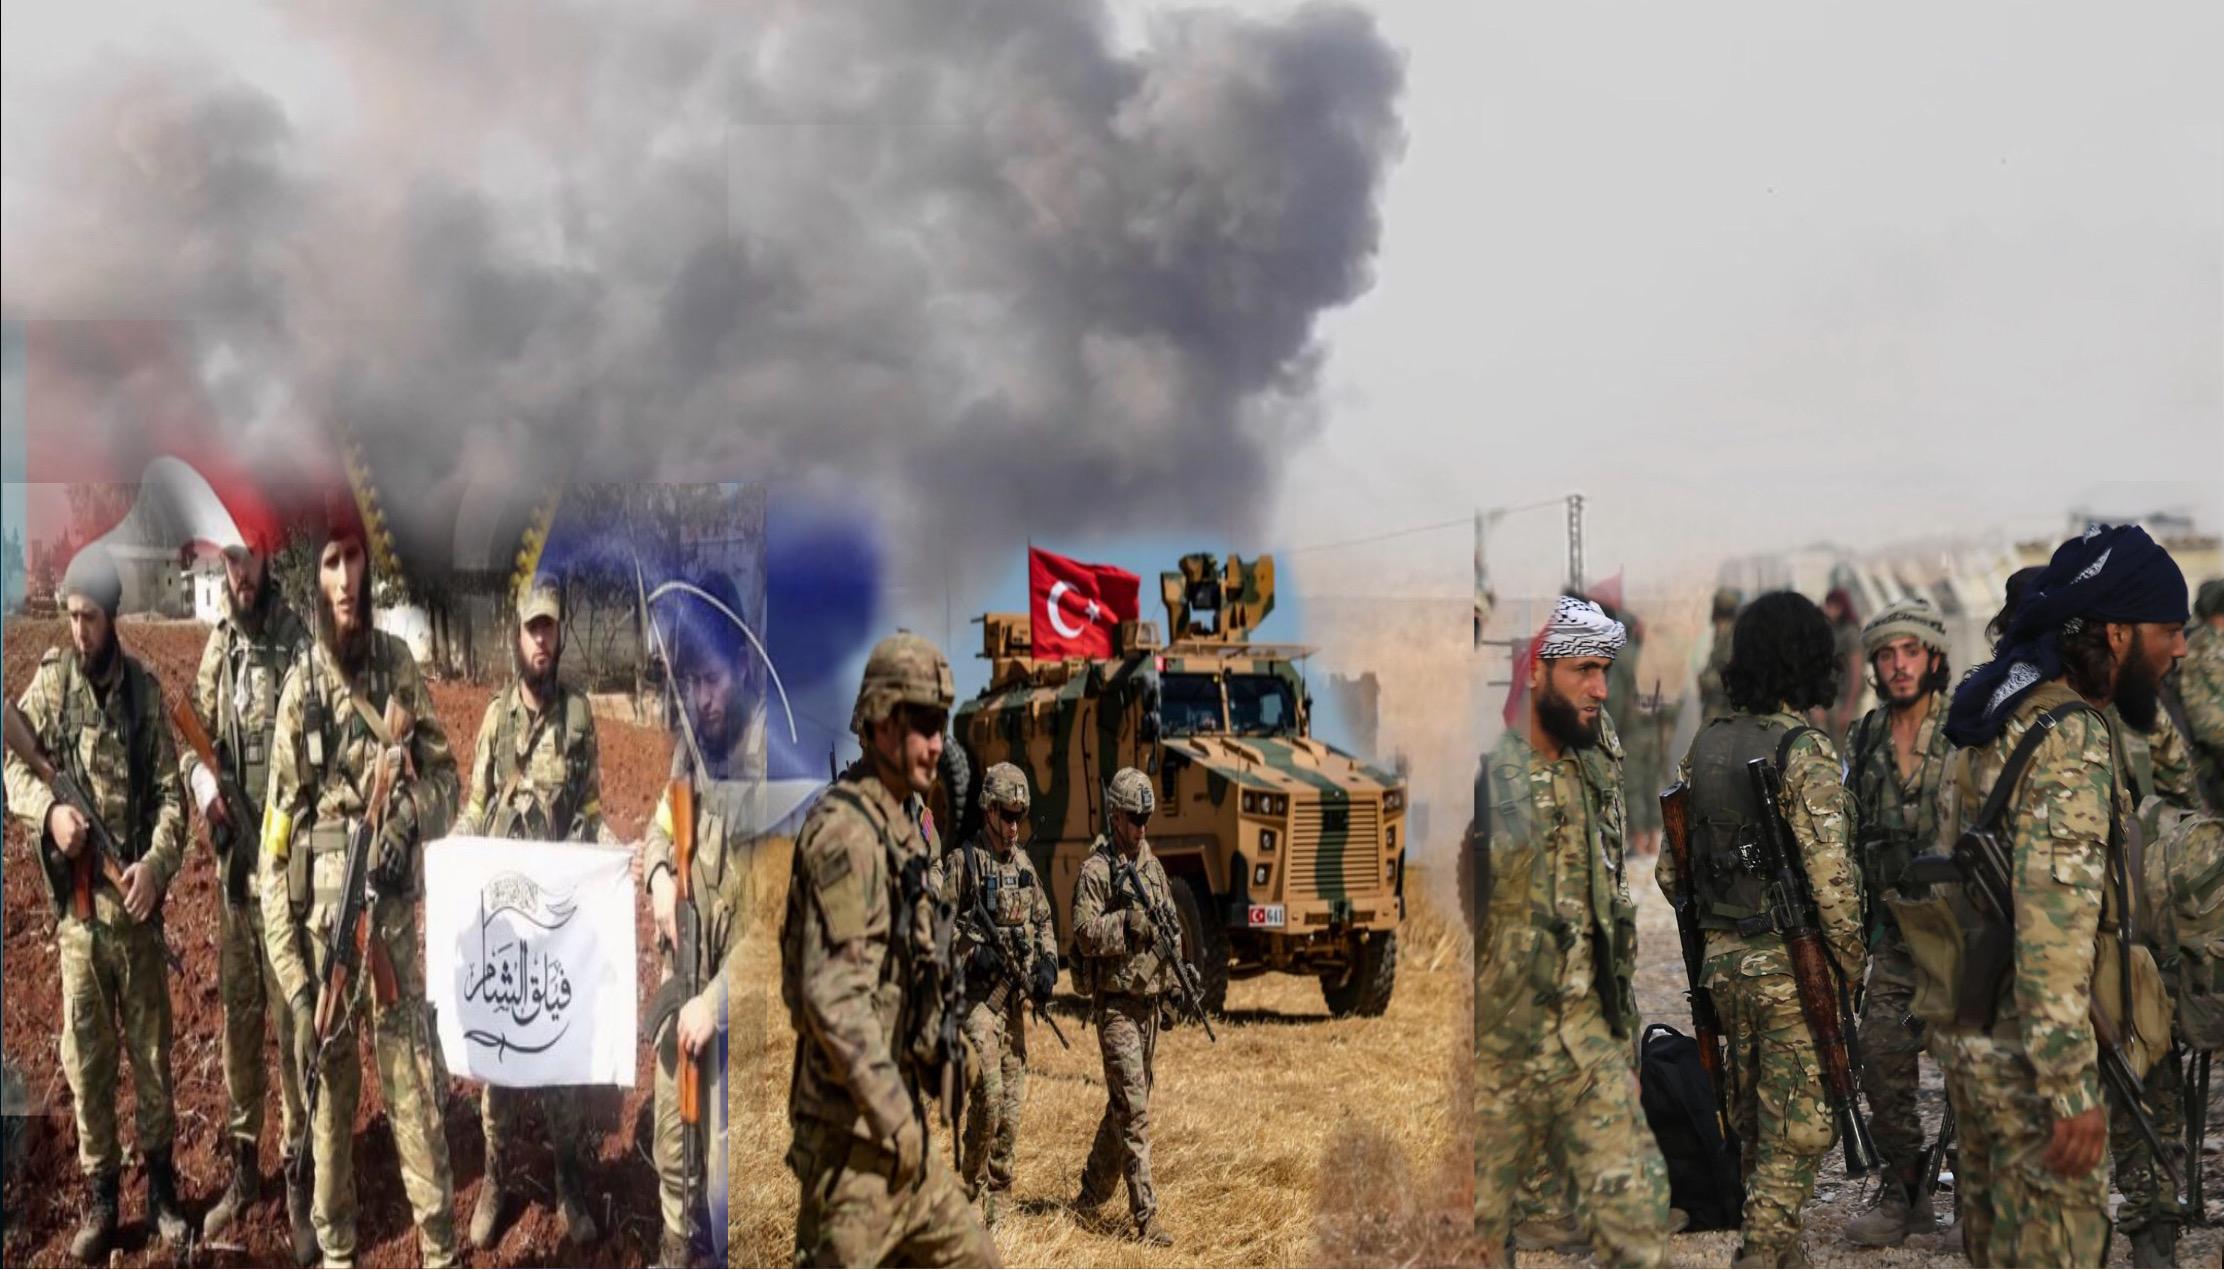 Photo of ألمانيا تؤكد ان لديها معلومات ان الفصائل الارهابية تقاتل الى جانب تركيا في سوريا